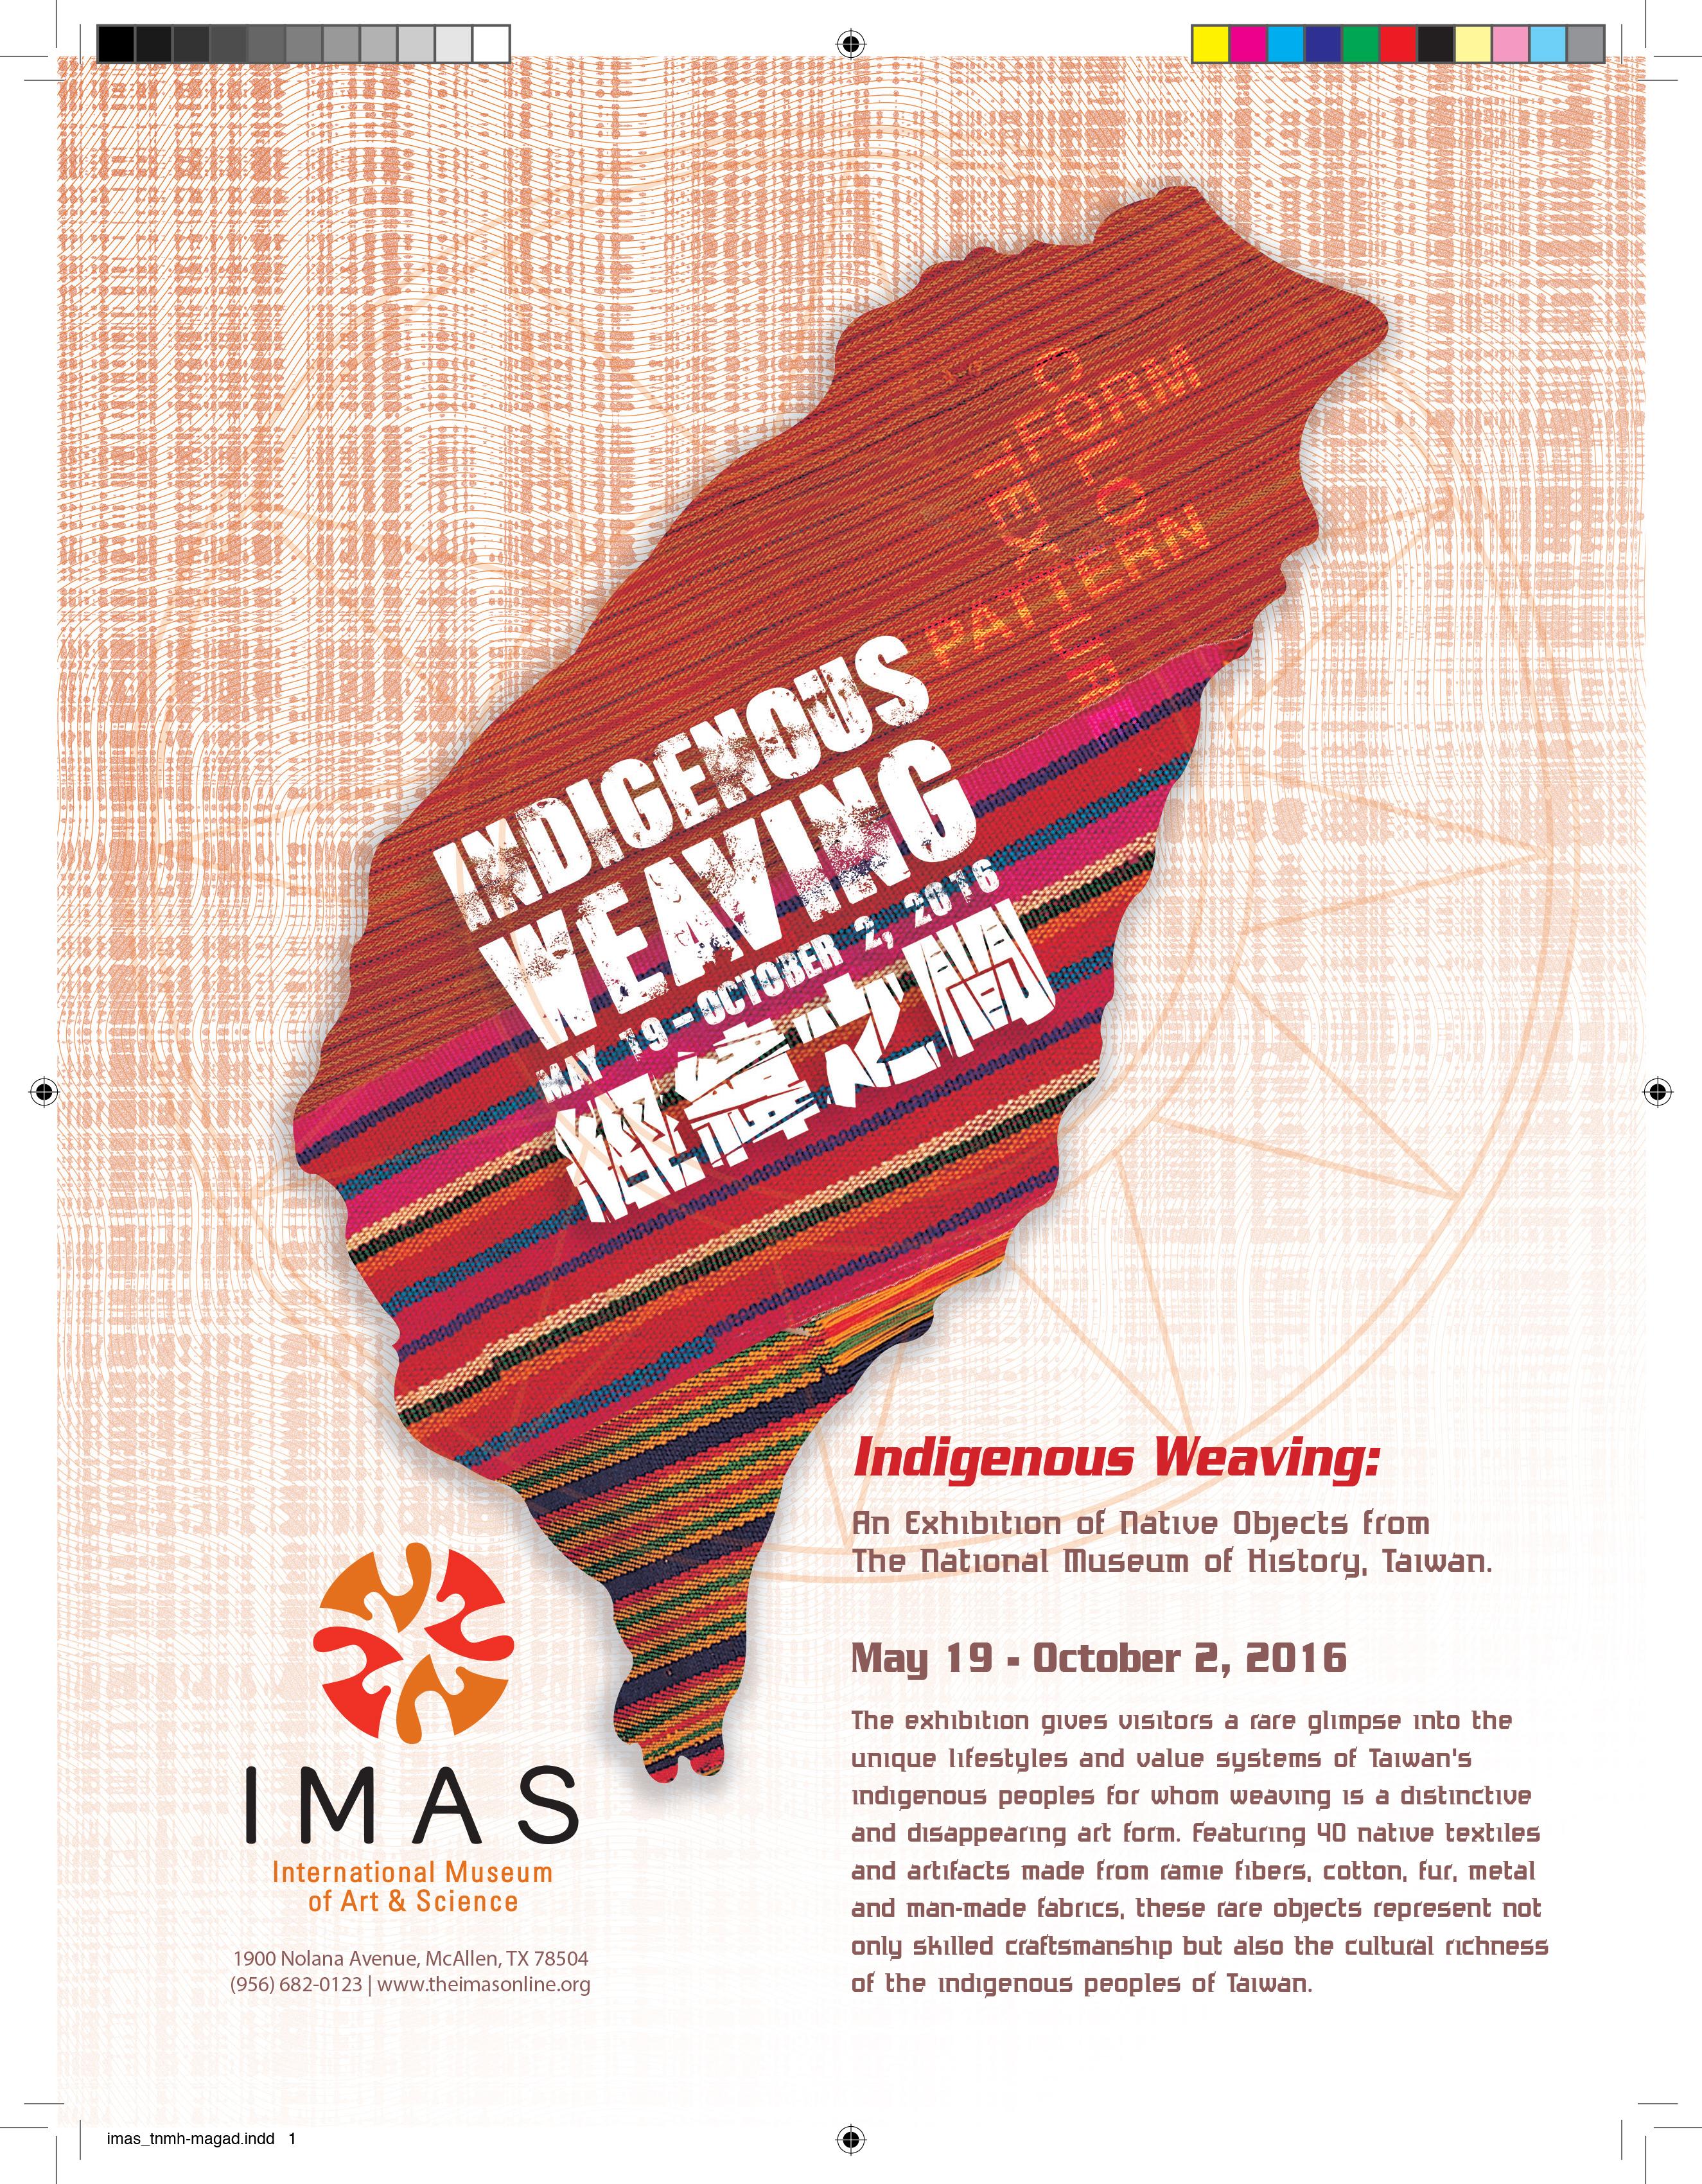 imas_indigenous-weaving-magad